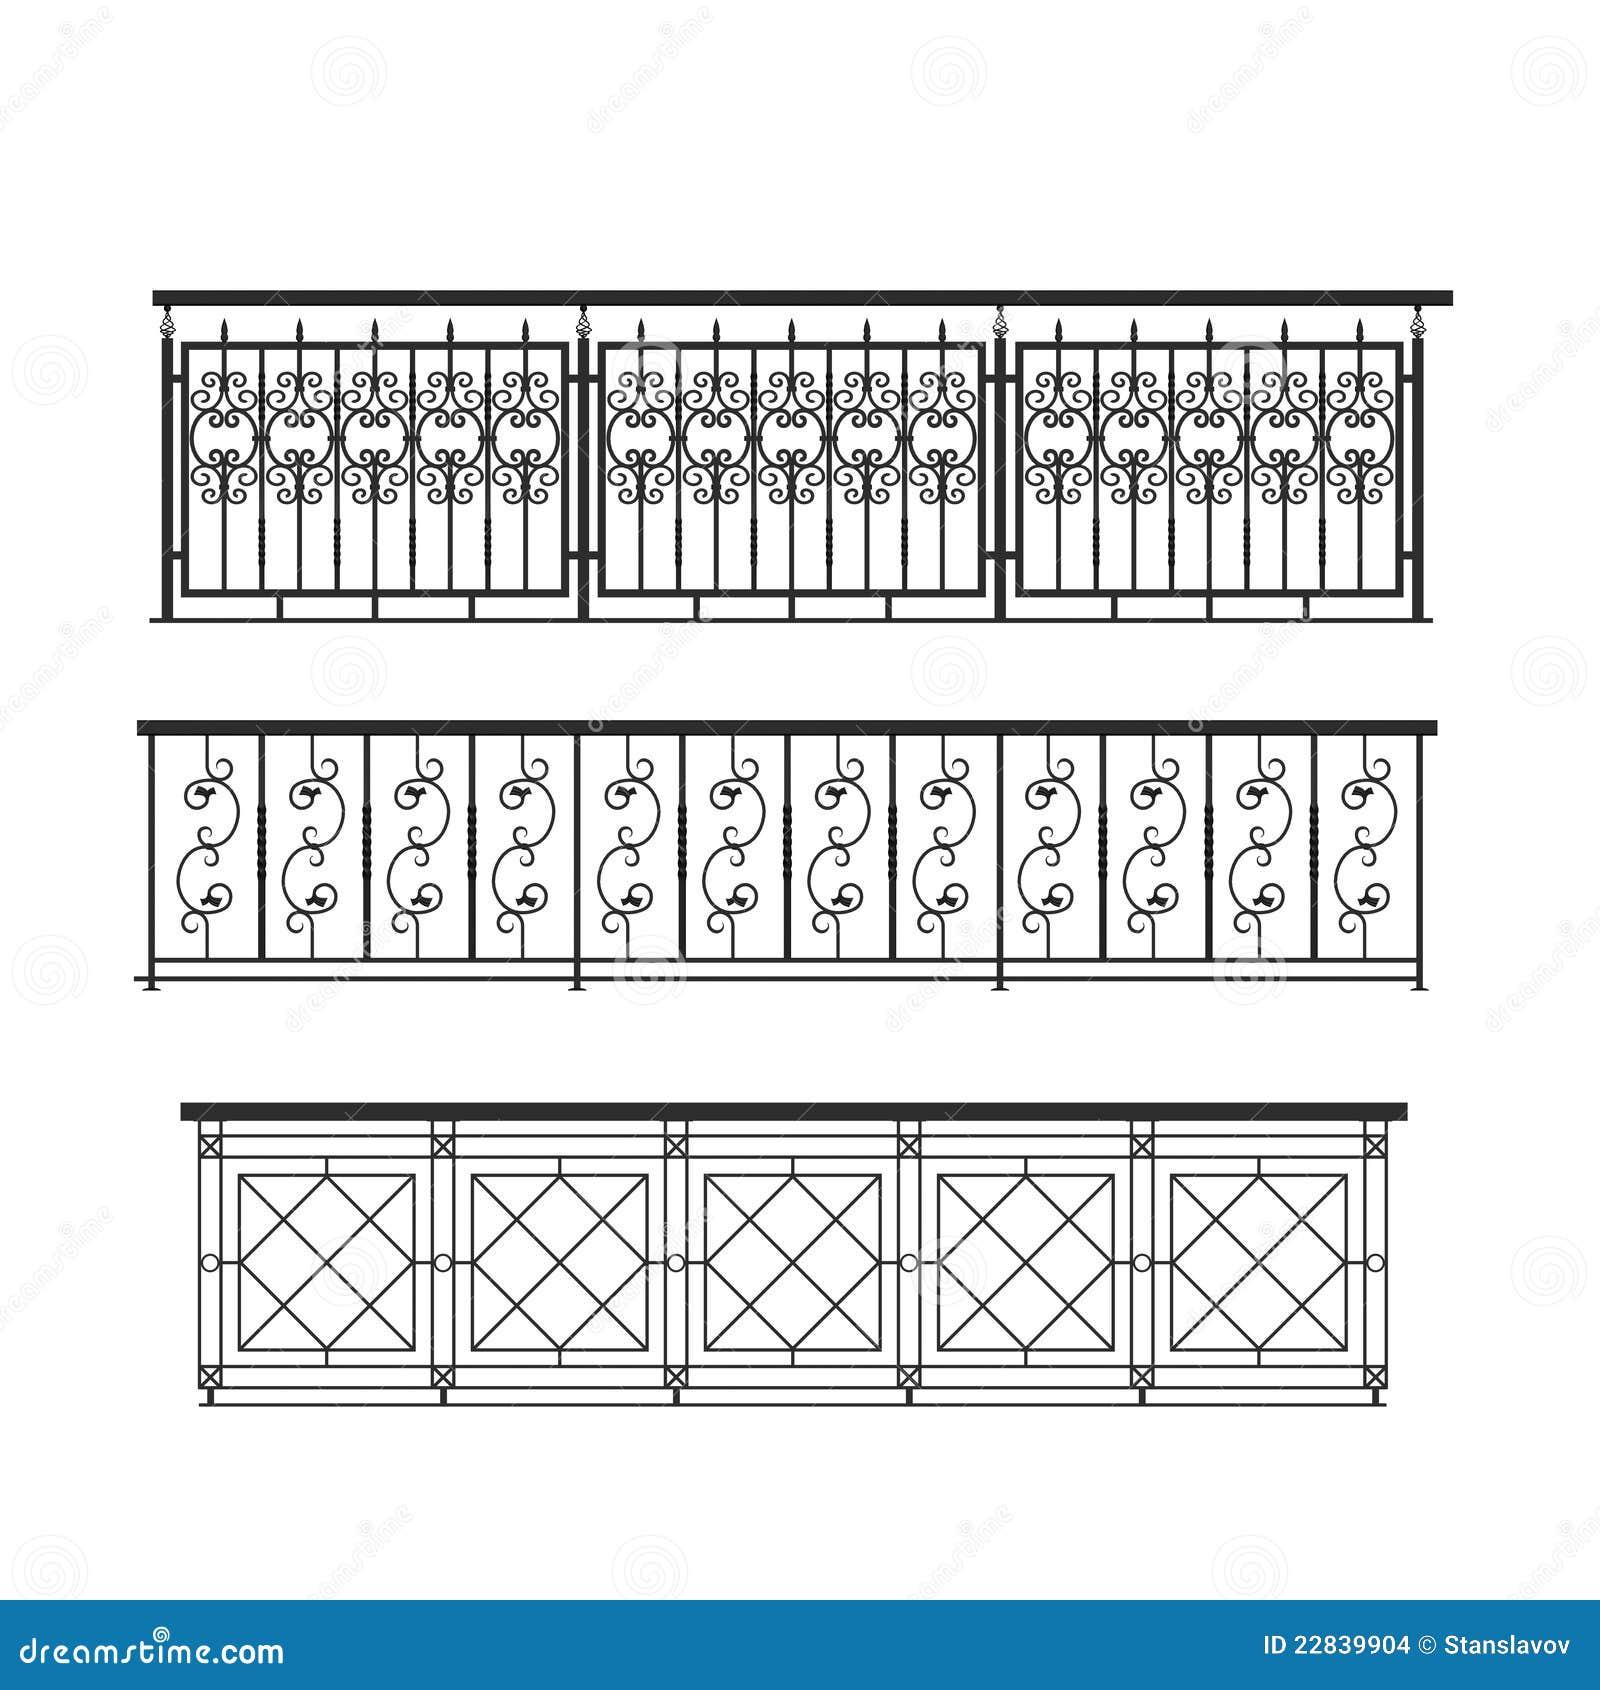 Railing parapet metal for exterior stock illustration for Time saver details for exterior wall design